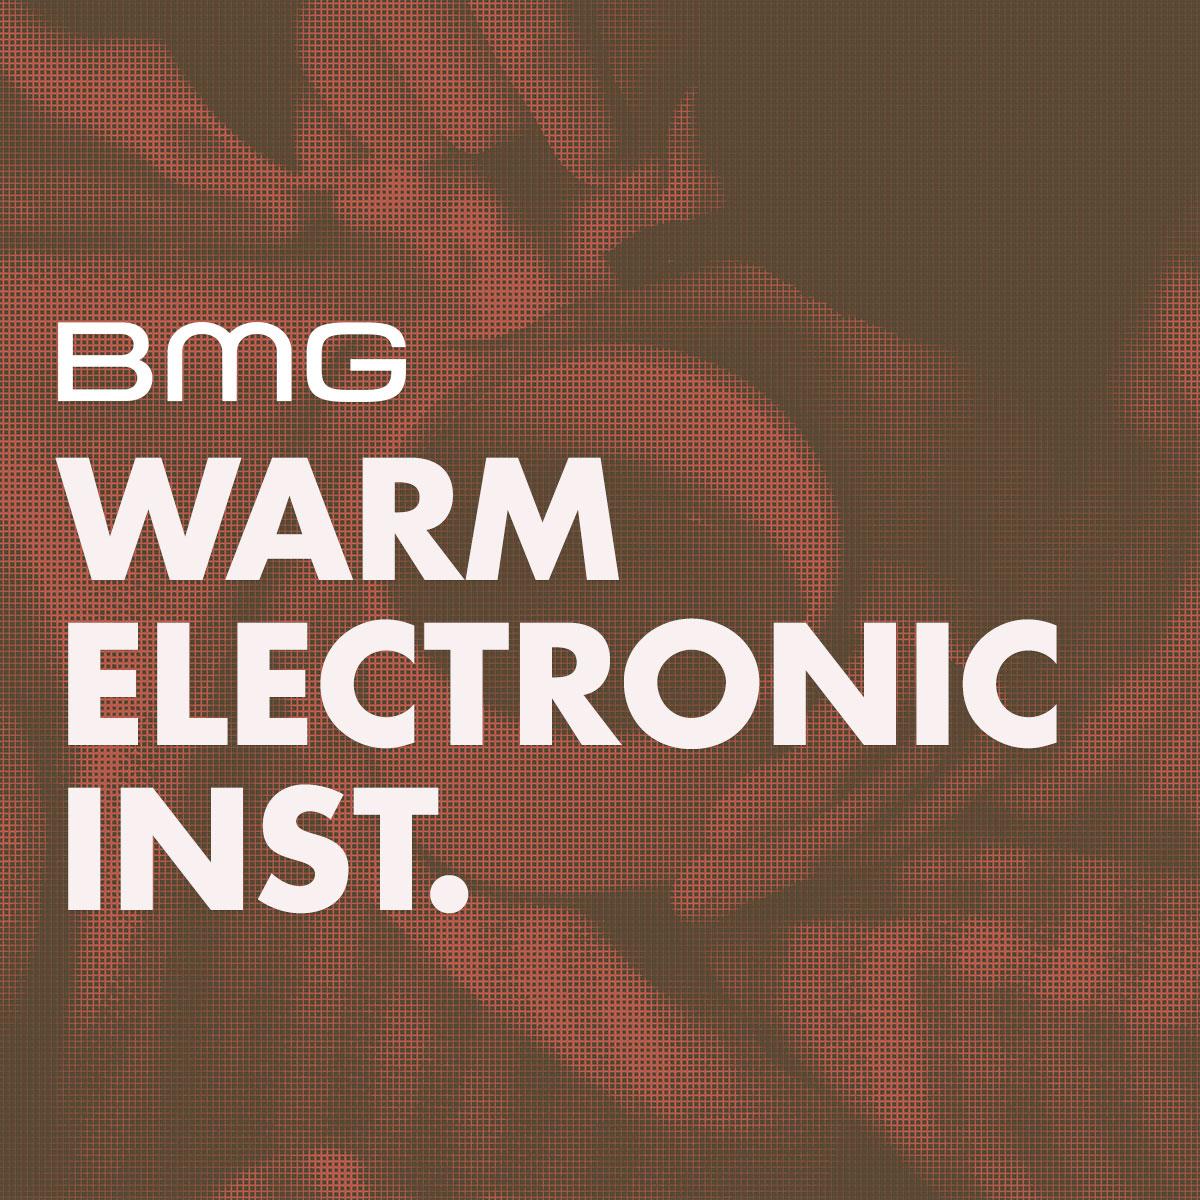 1200-x-1200-Warm-Electronic-Inst.jpg